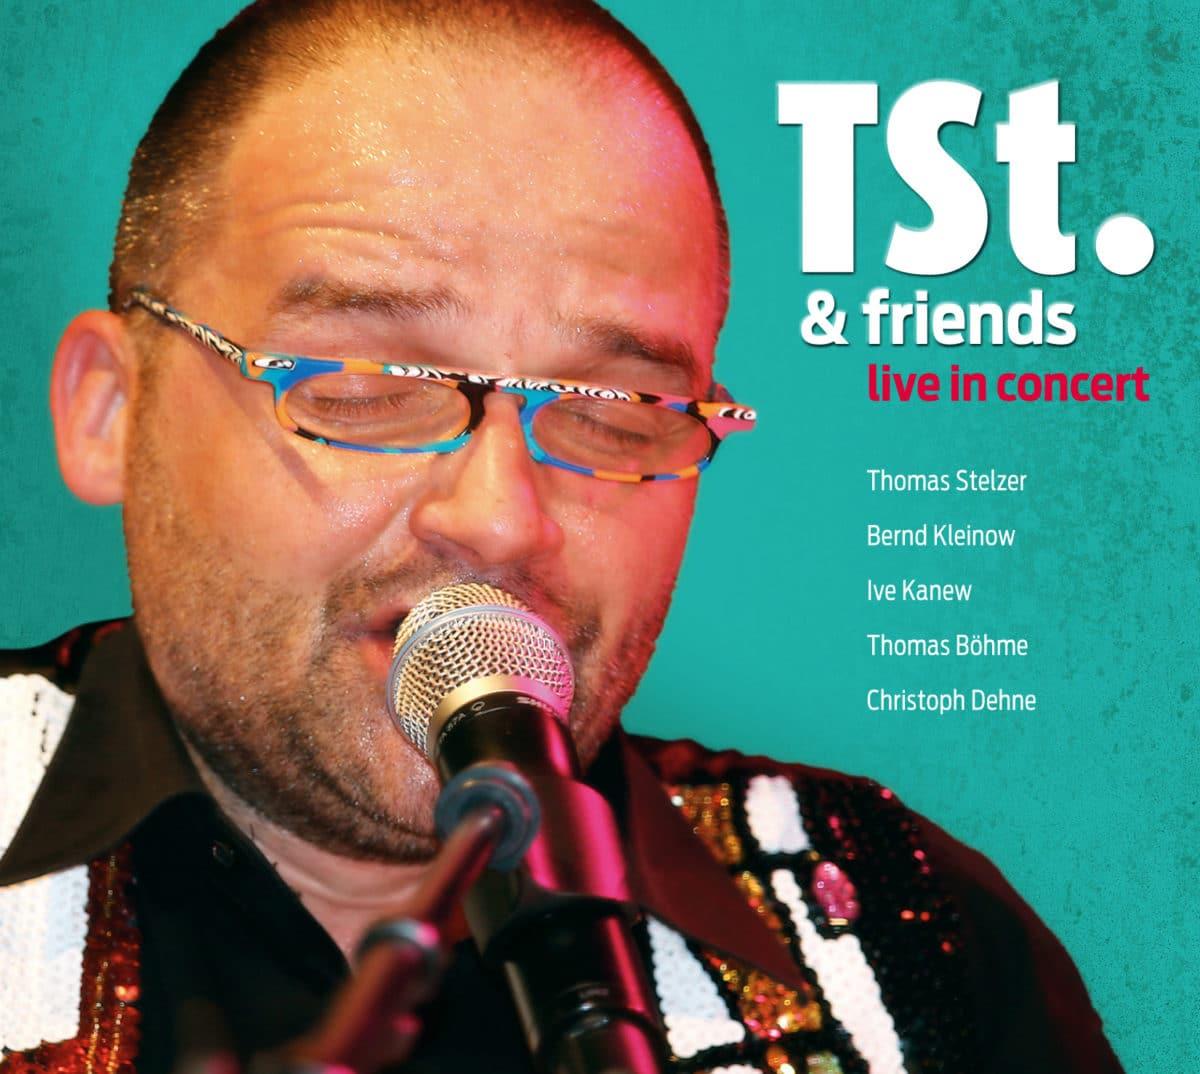 Thomas Stelzer & Friends - Live In Concert